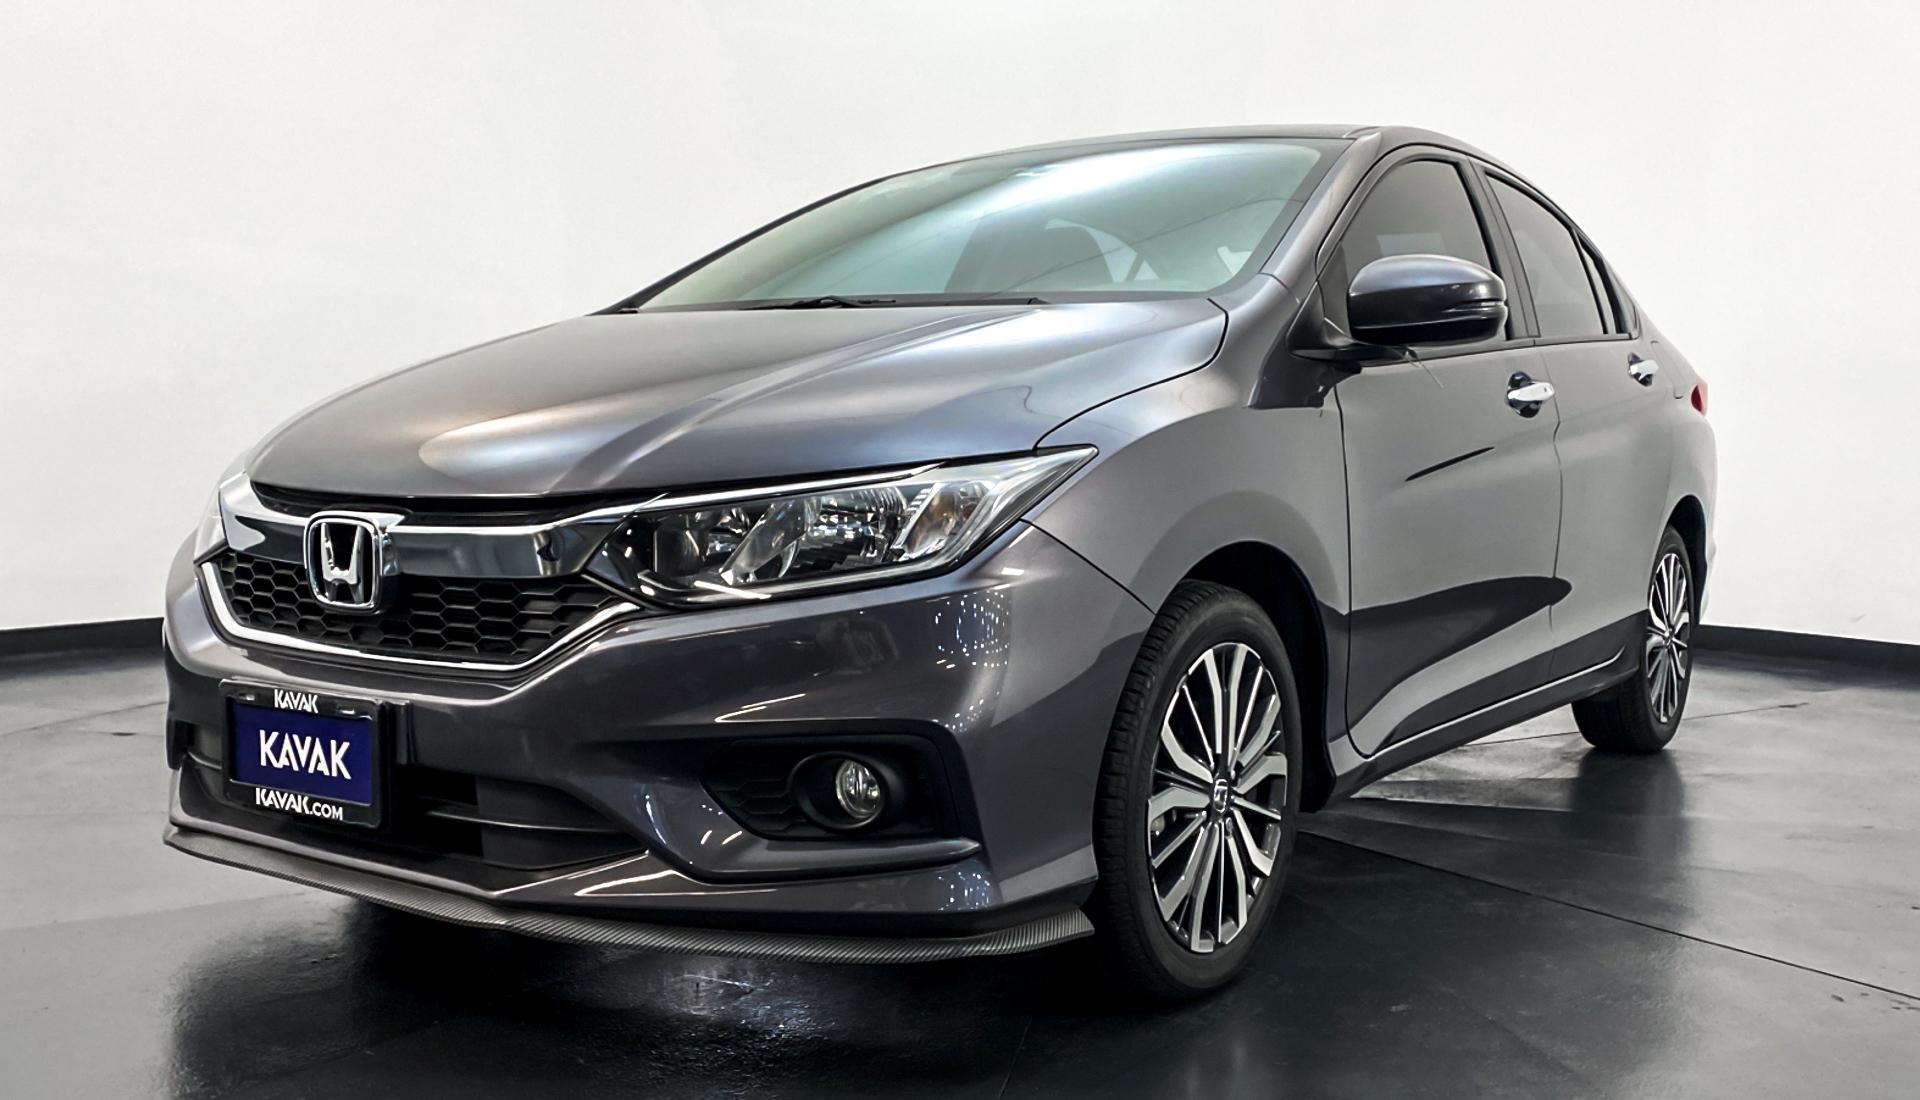 Honda City 2019 #27829 | 12604 KM | Precio: $267999